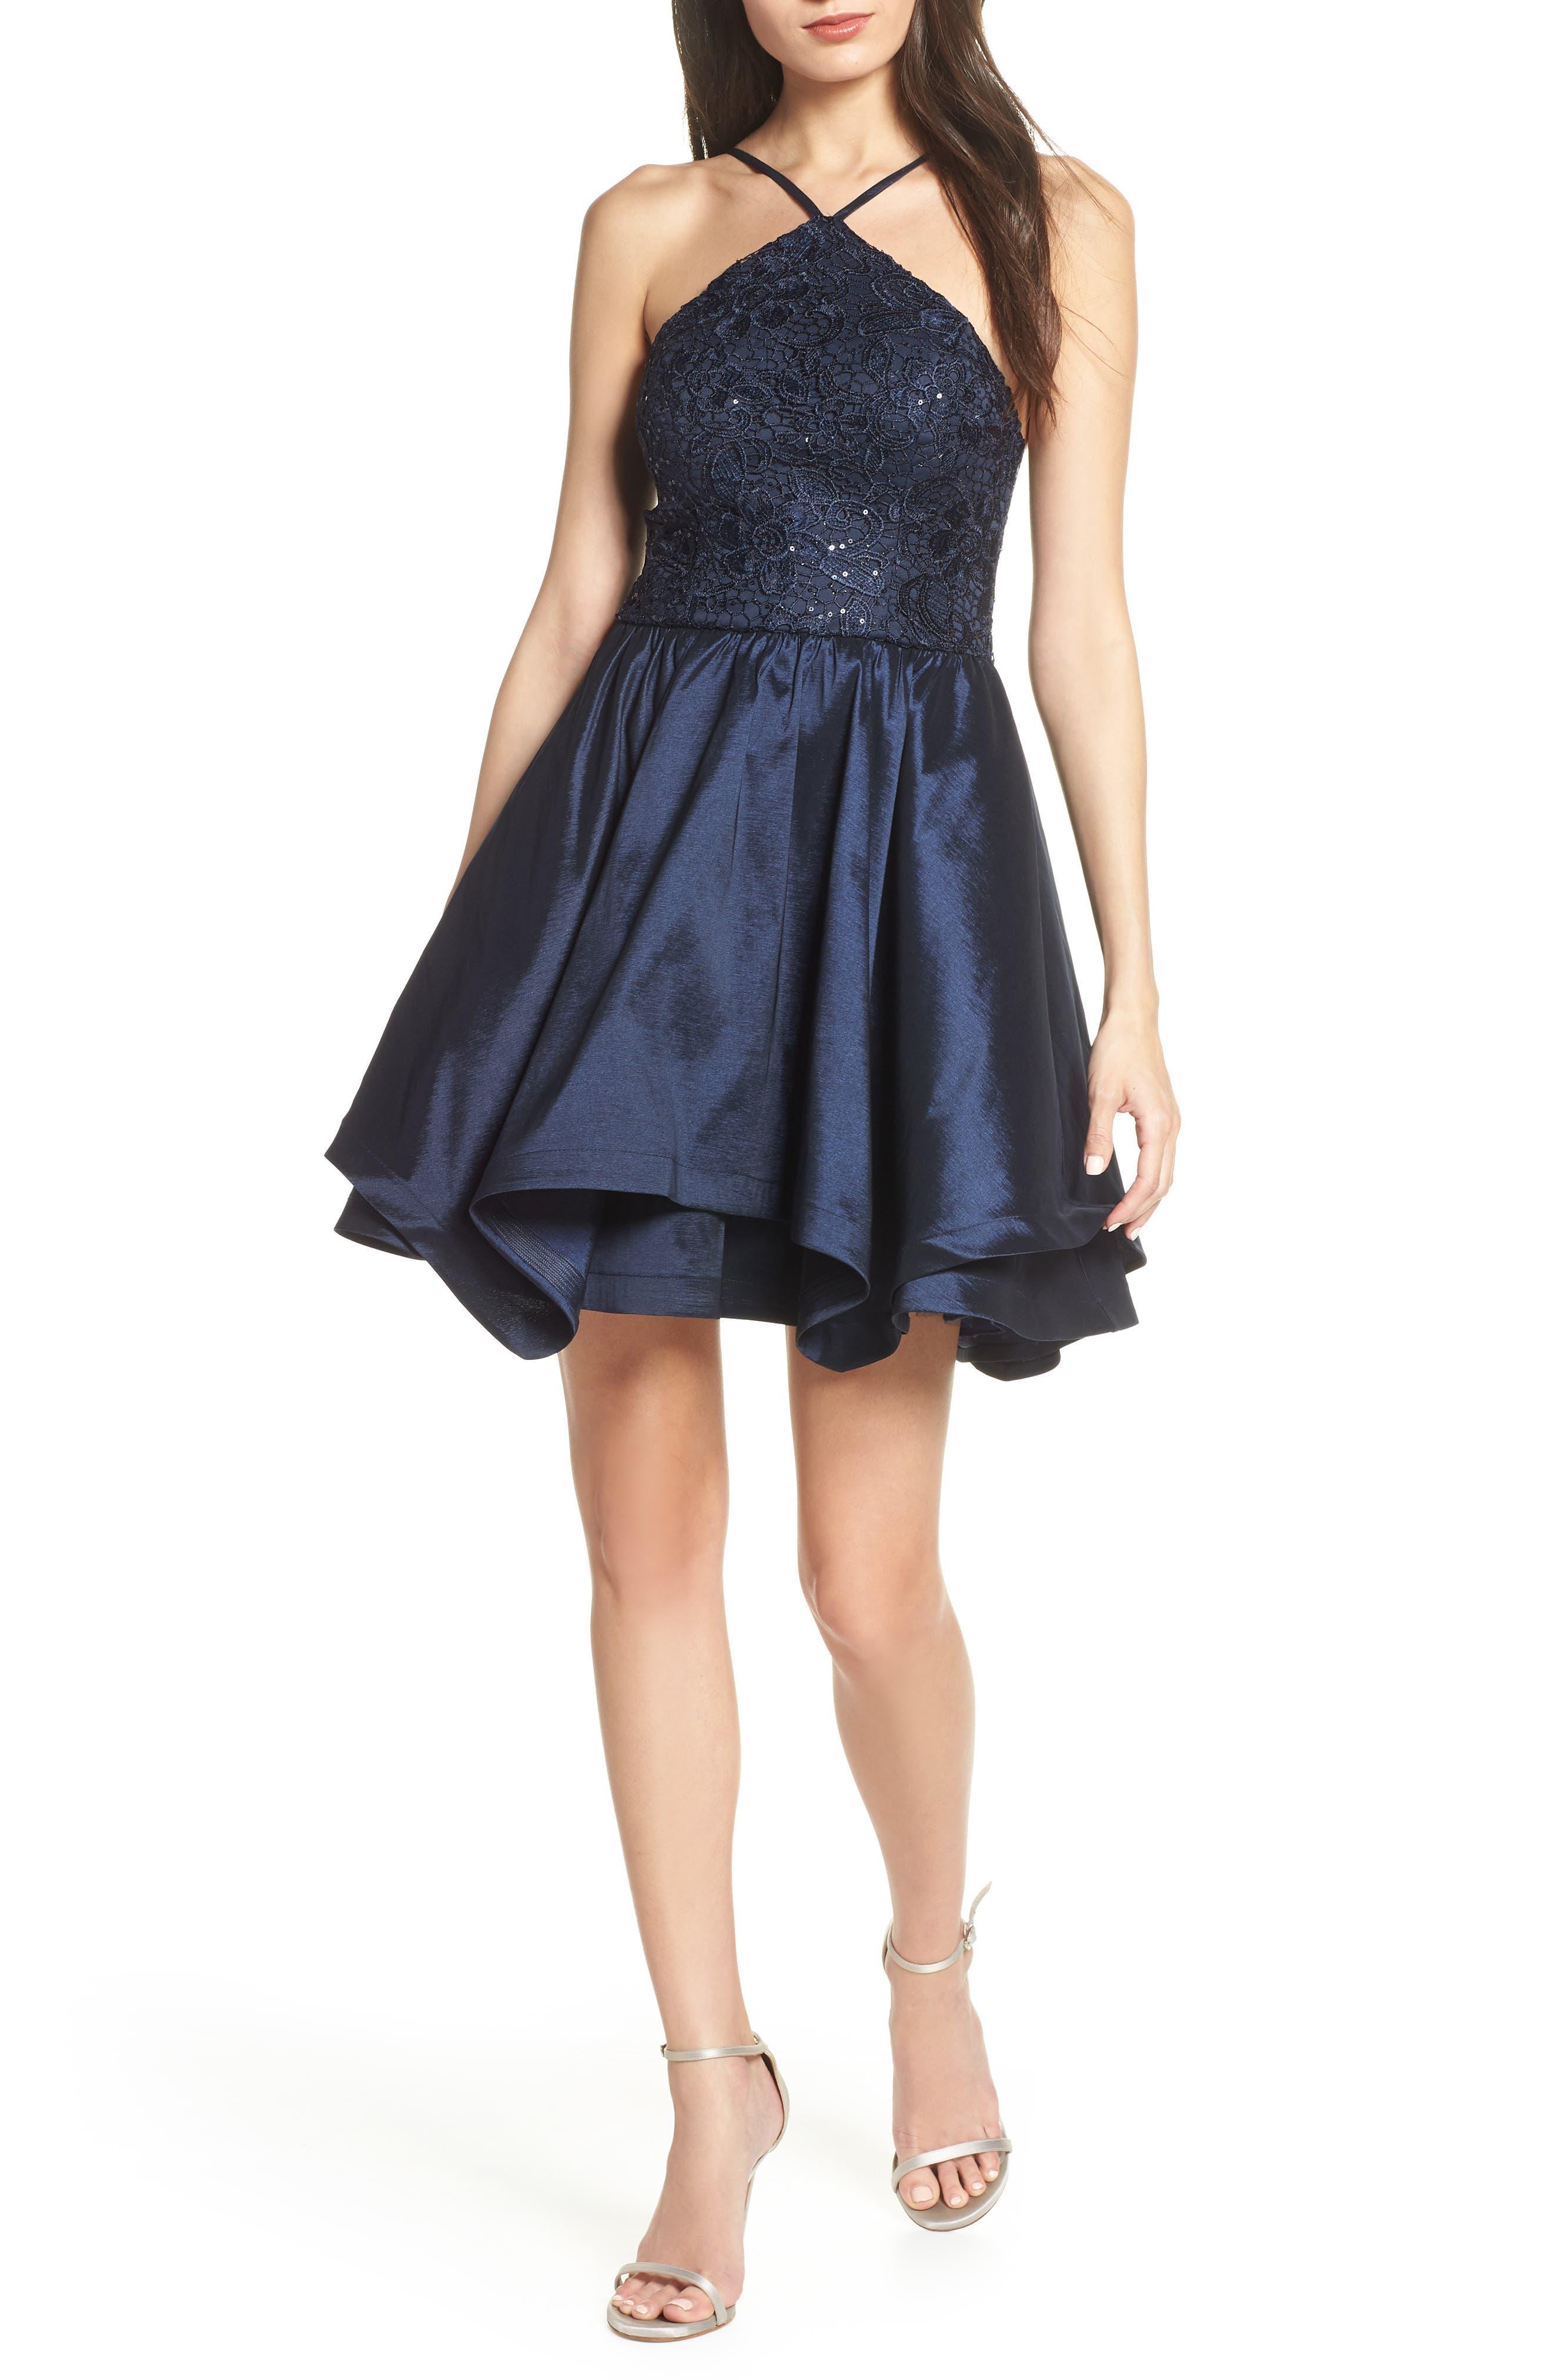 Sequin Hearts Stretch Taffeta & Lace Halter Neck Party Dress, Blue